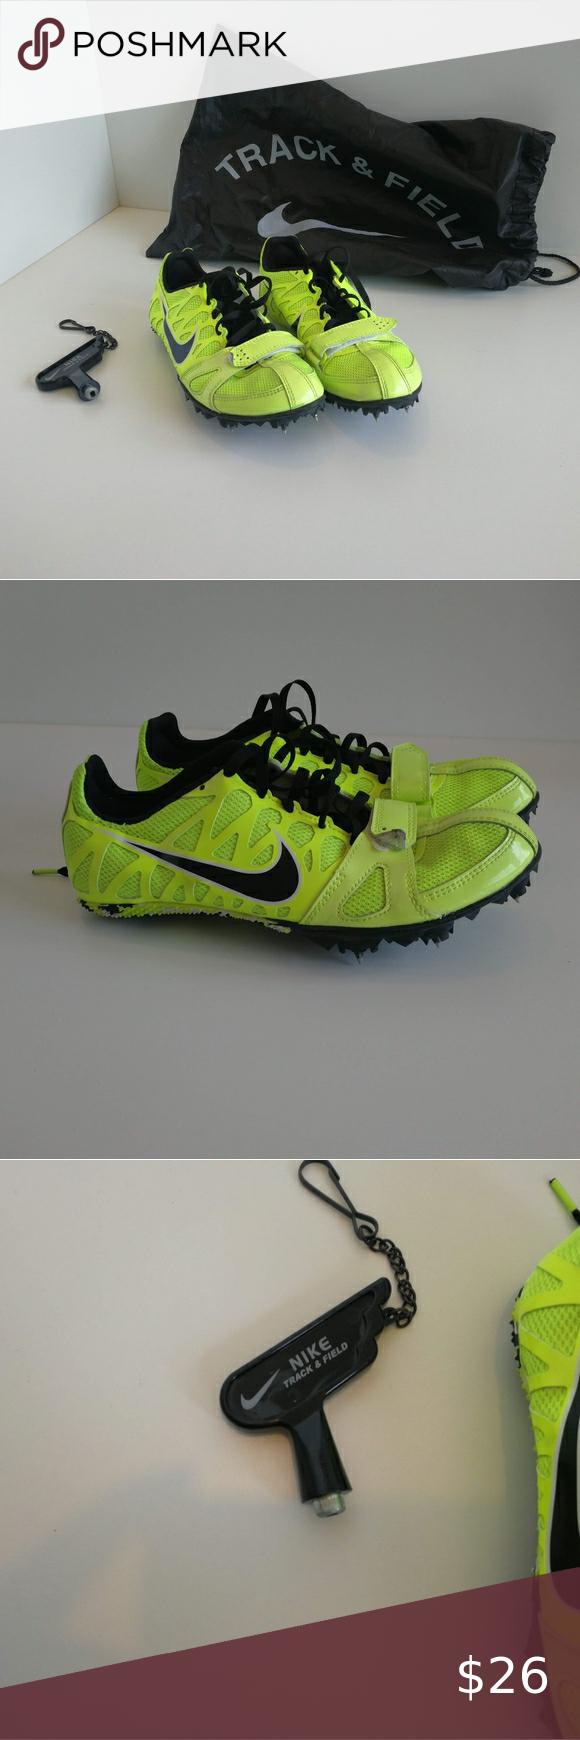 Nike Boys size 4, Neon Yellow Soccer